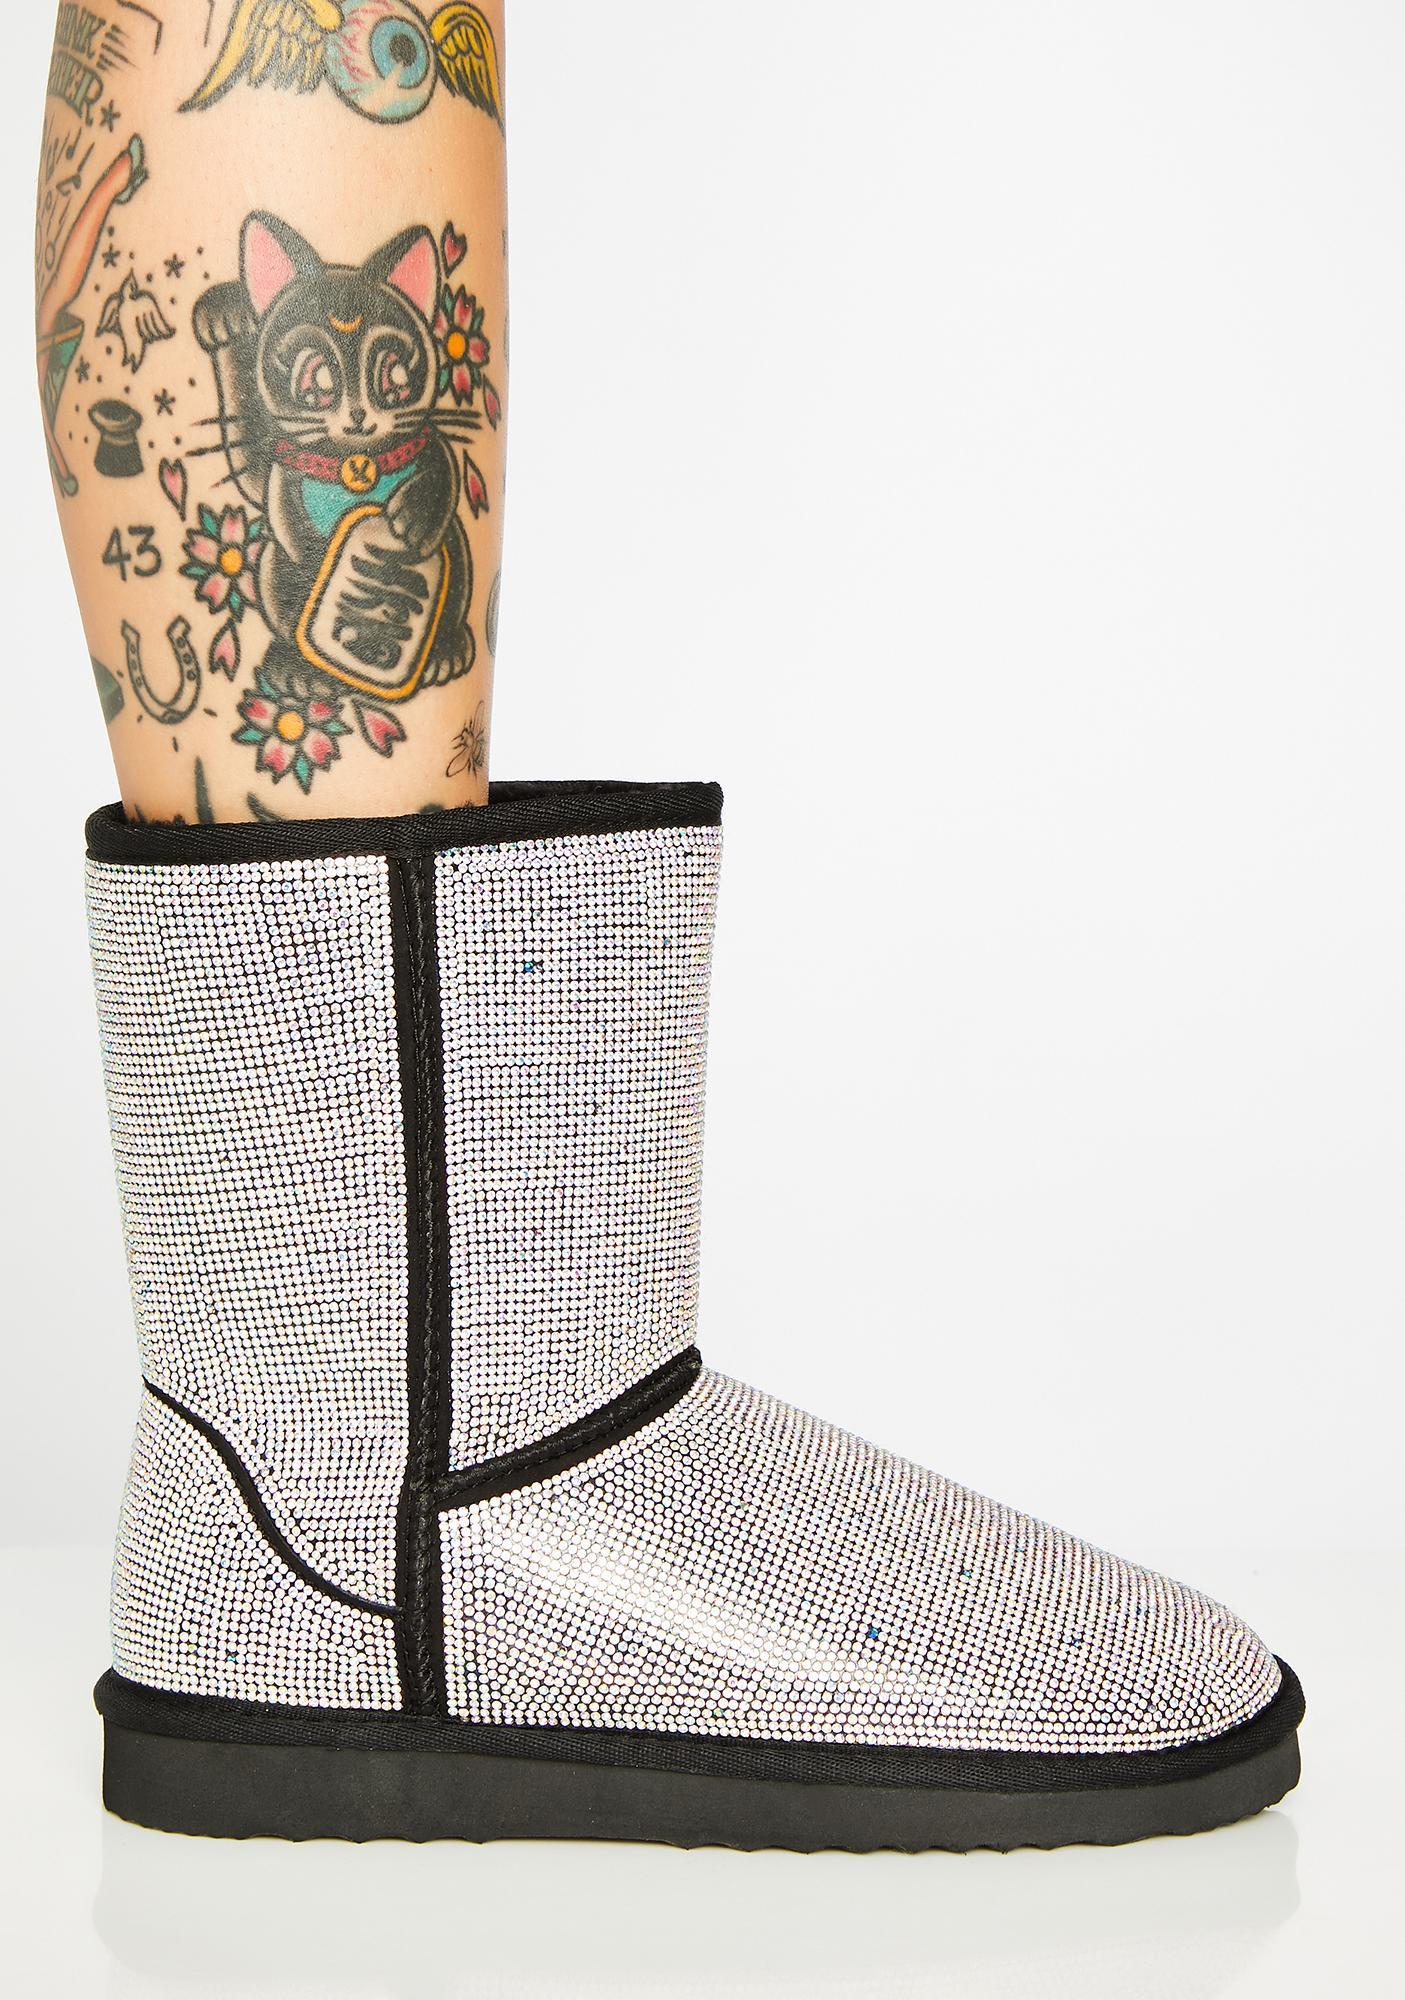 Number One Stunna Rhinestone Boots